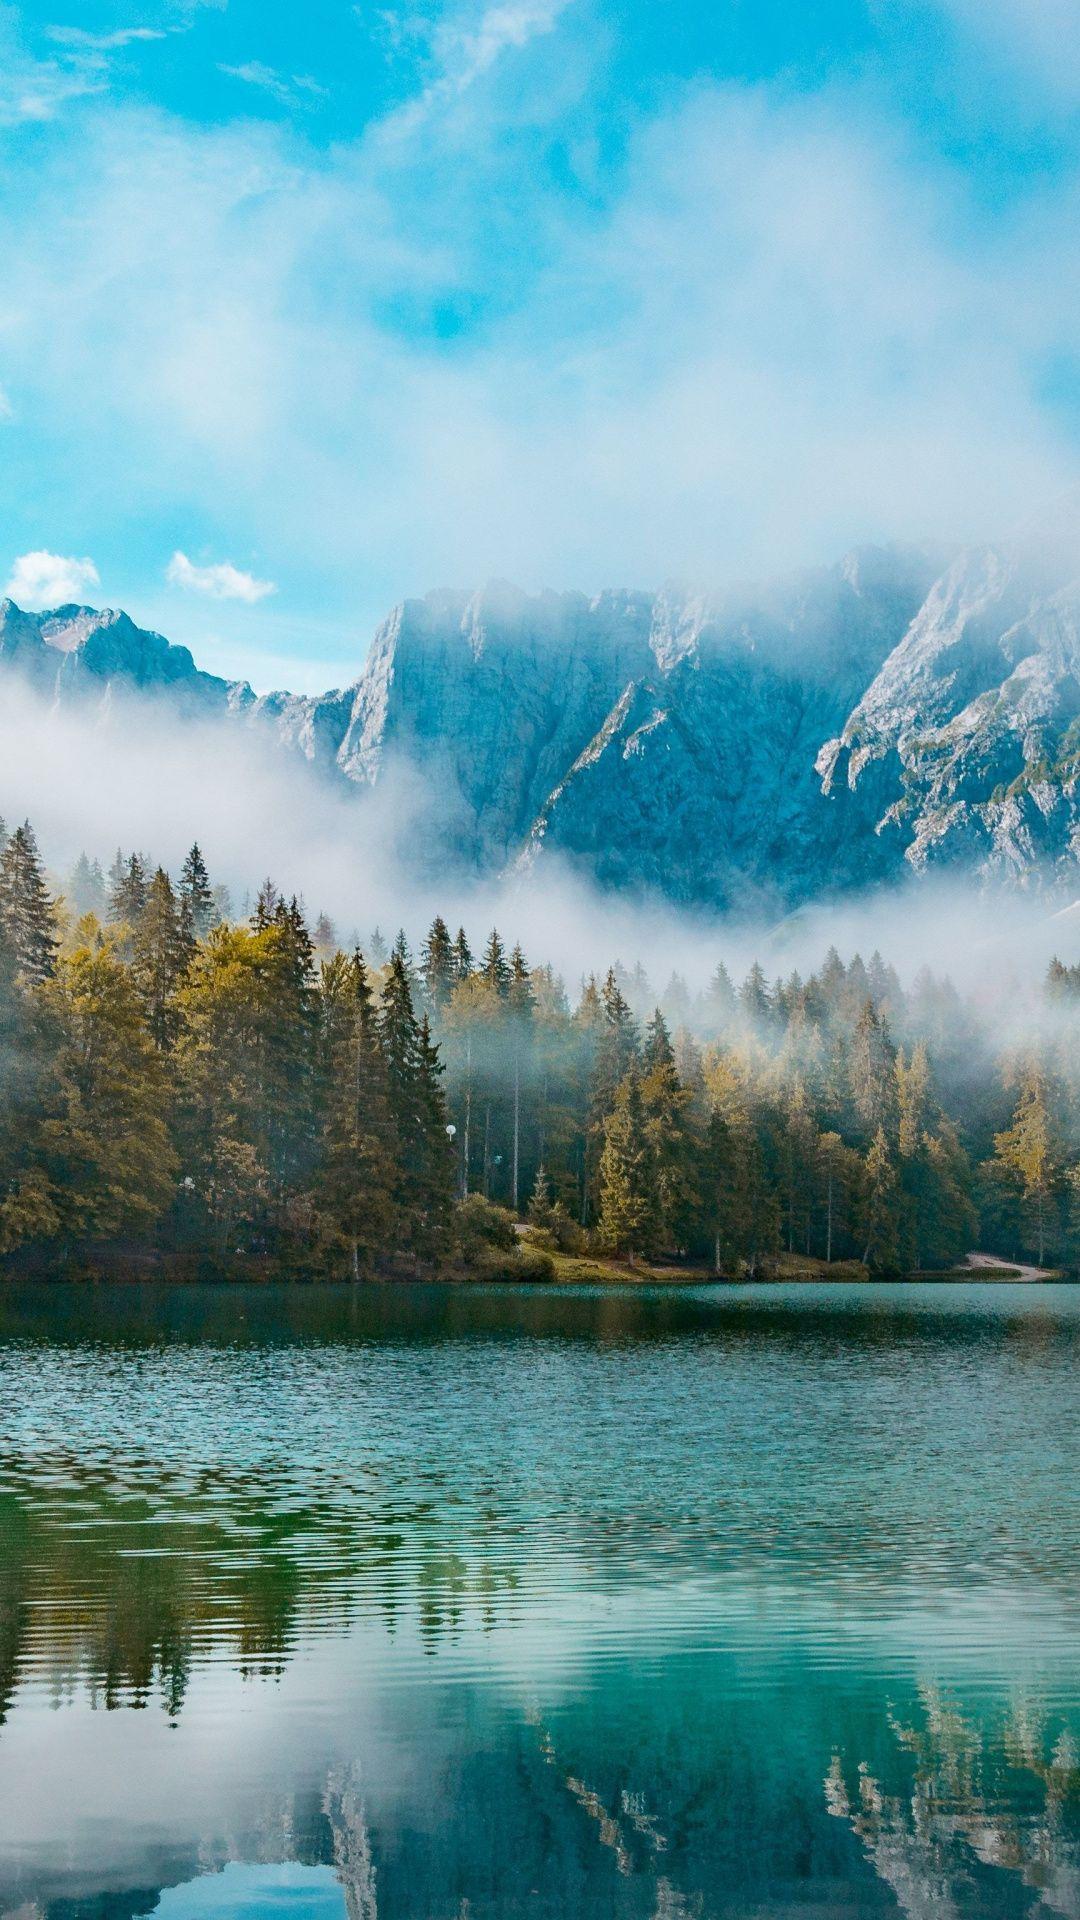 Nature Lake Mountains Laghi Di Fusine Italy 1080x1920